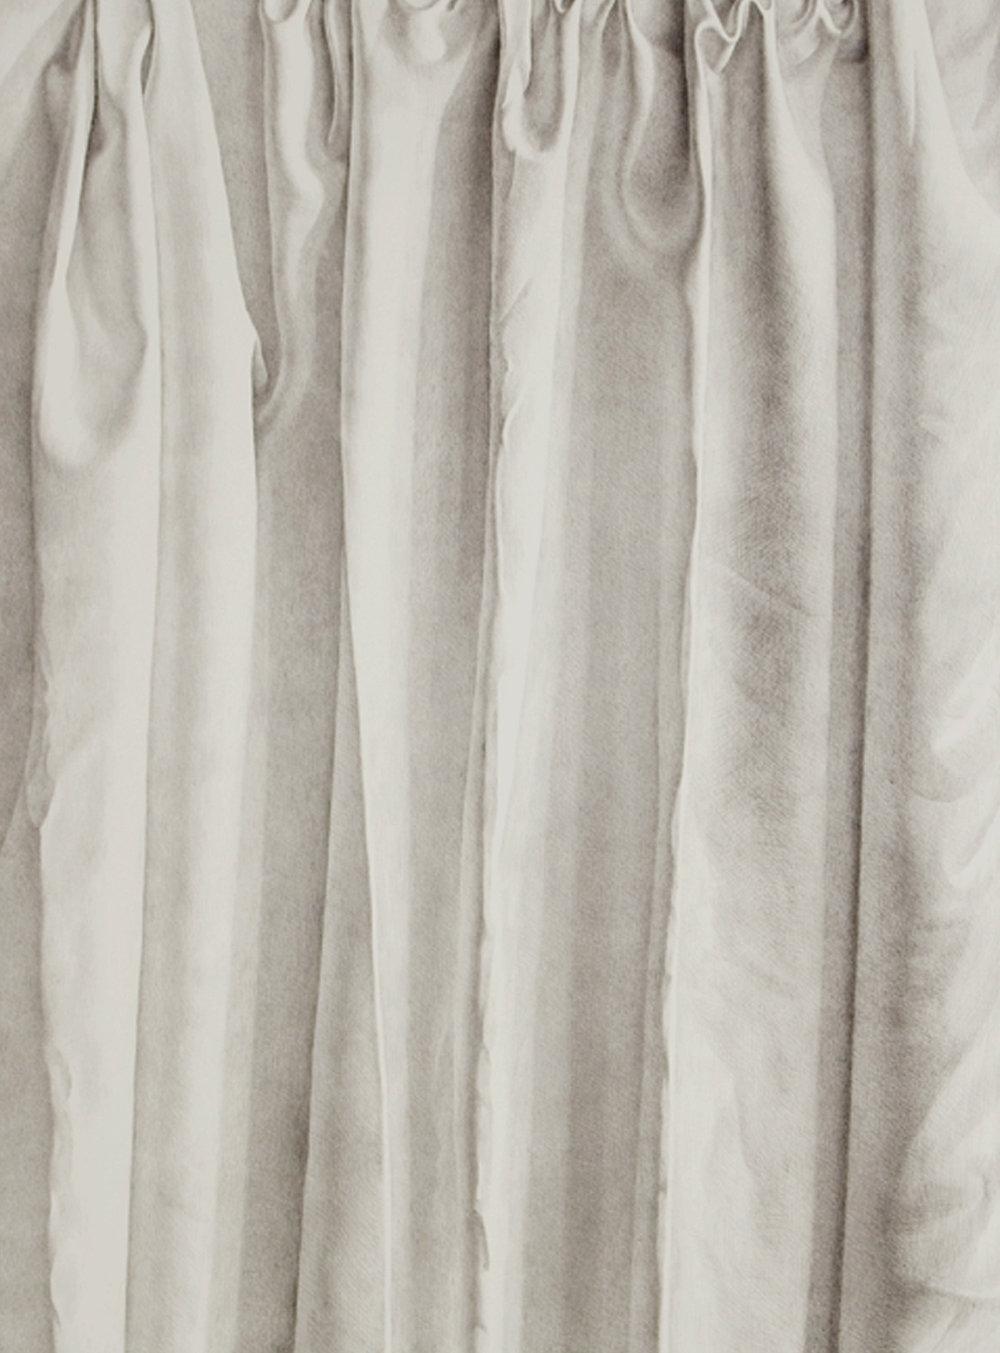 "Claudio Bravo(BIO), Venus (Black), 1998, lithograph, 38 1/4"" x 29 1/2"""